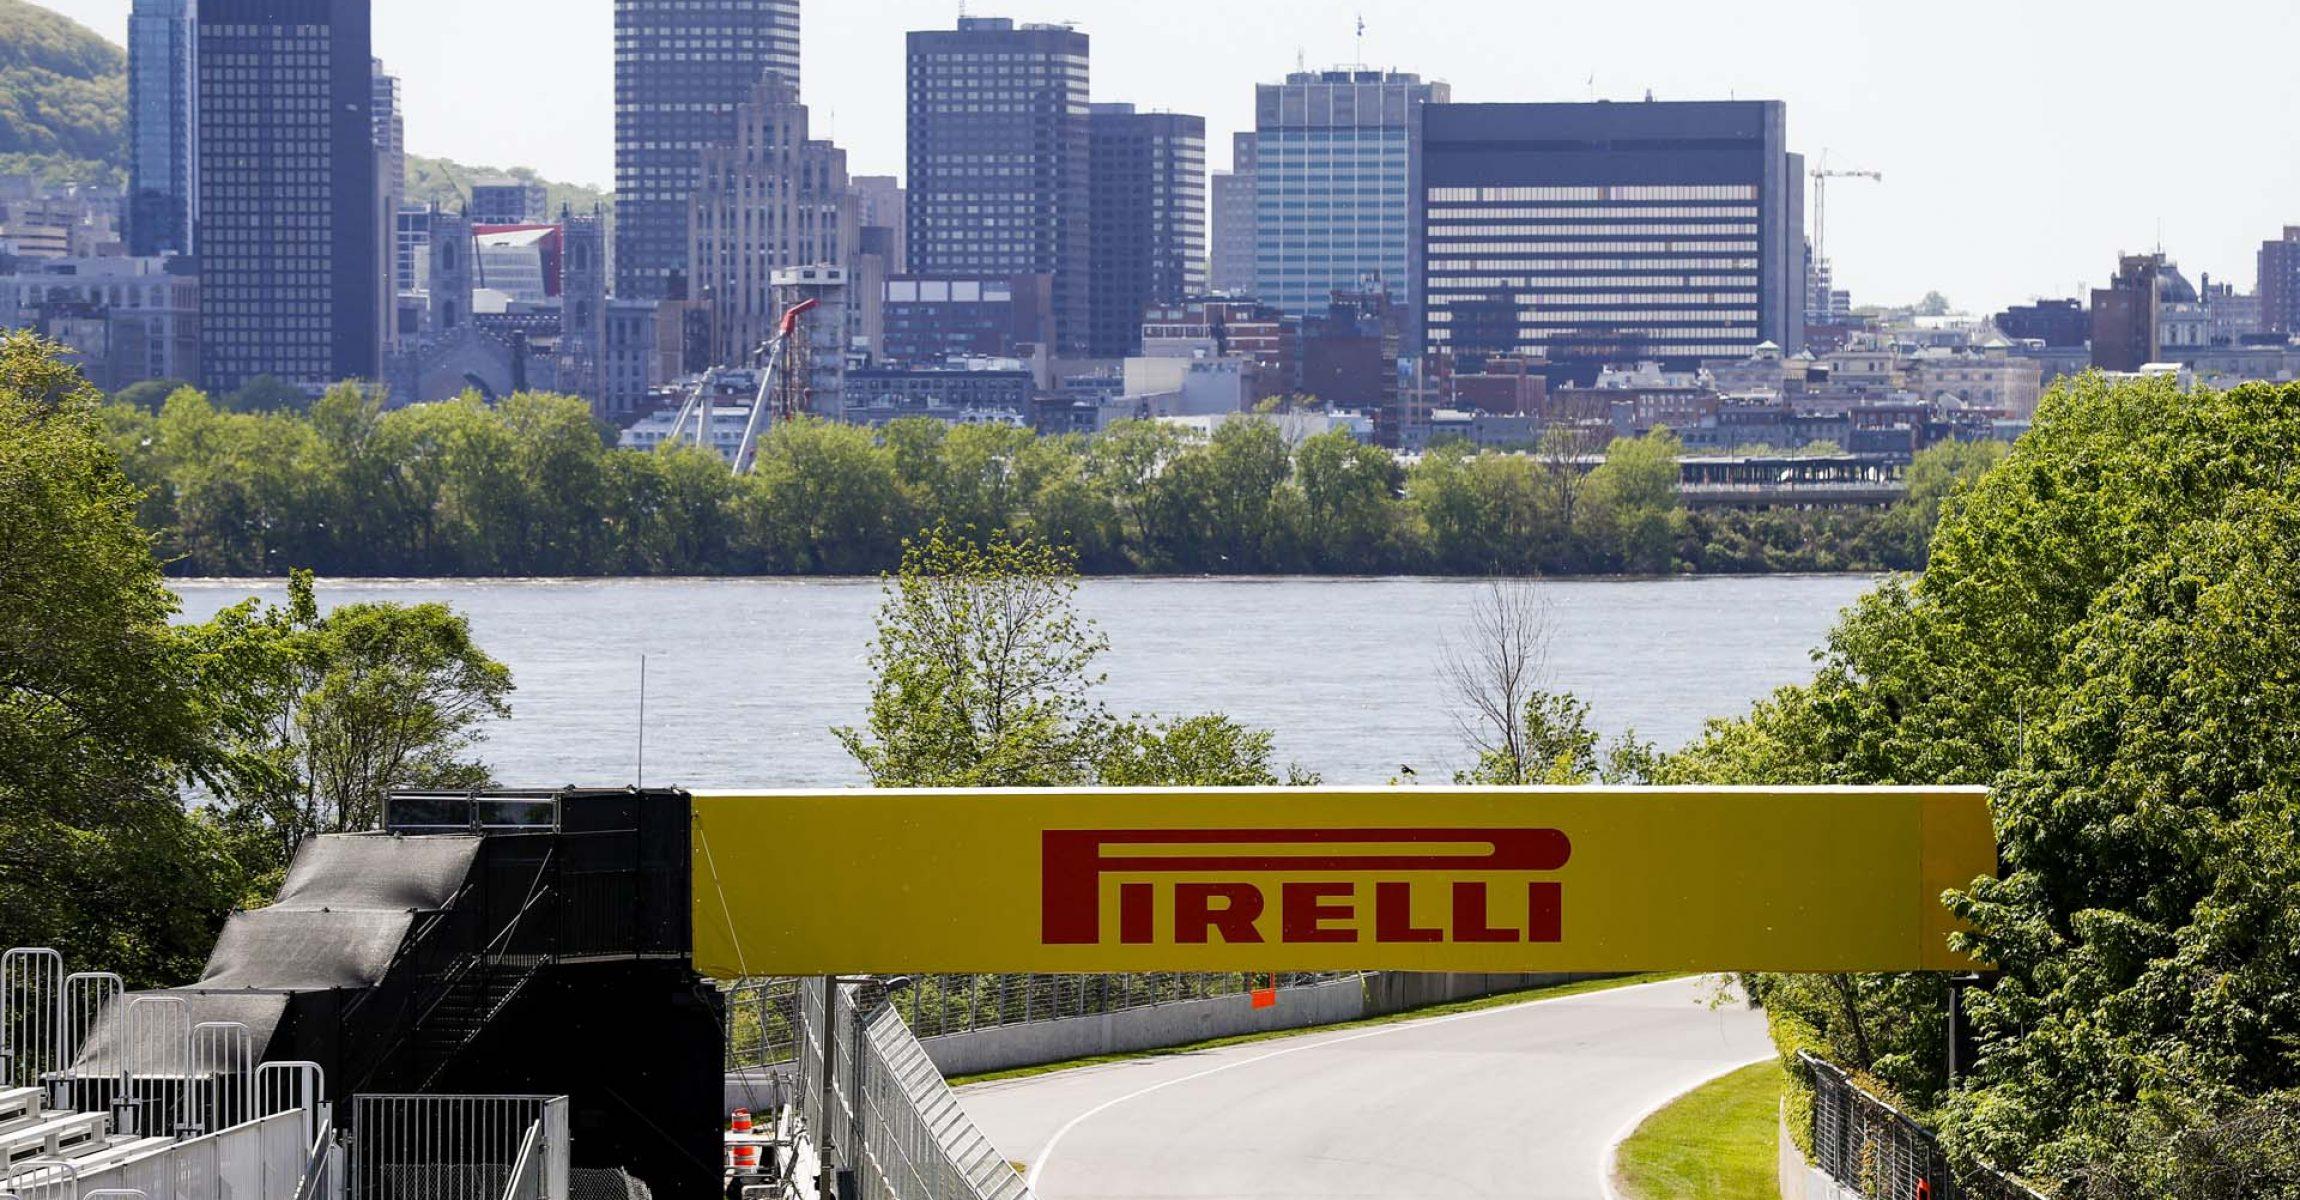 Montreal, Pirelli